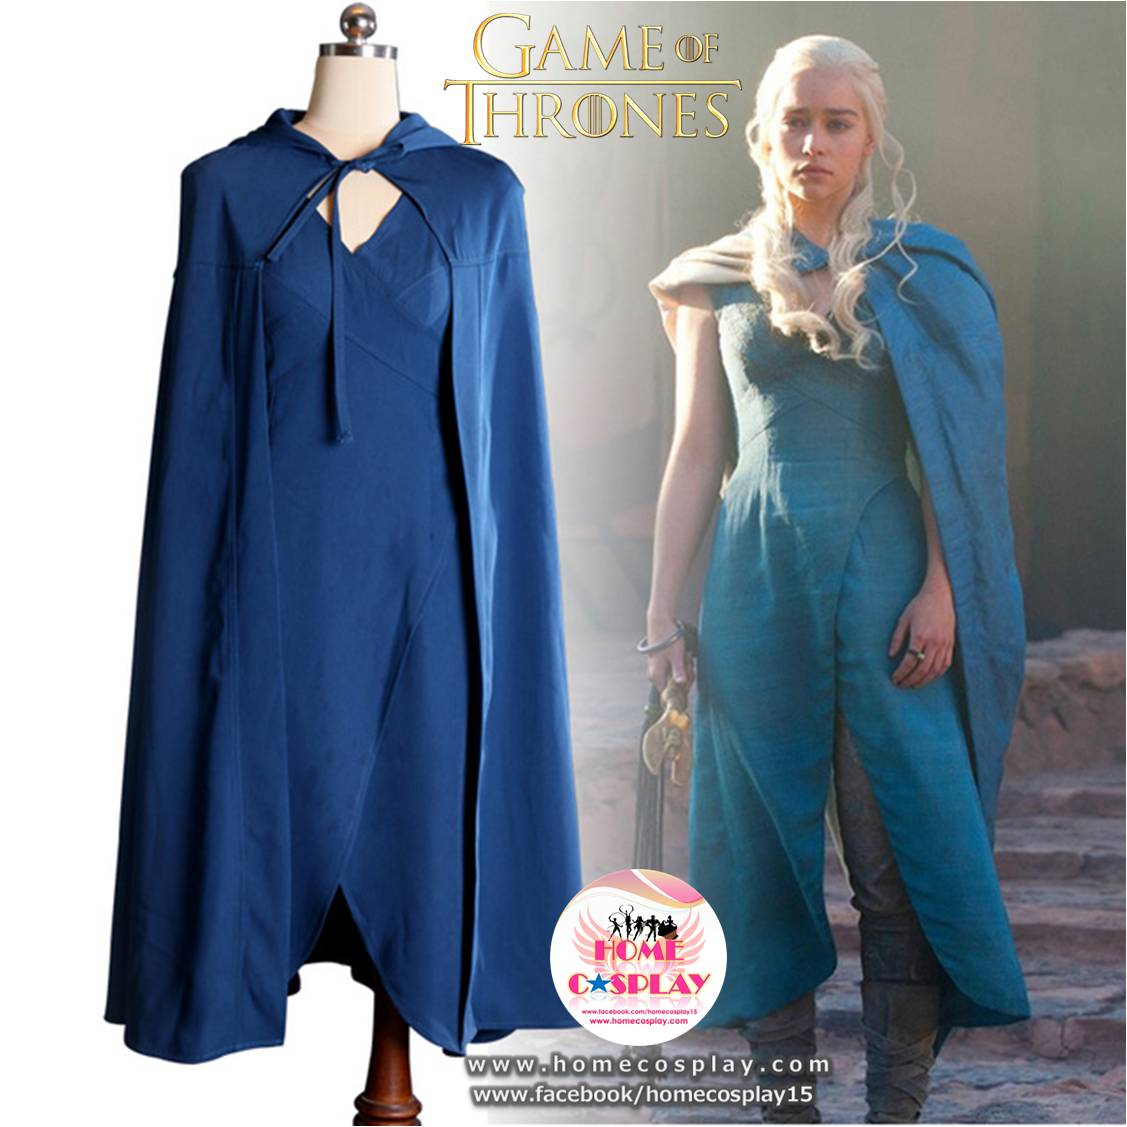 Super Premium Set: #1 ชุดแดเนริส ทาร์แกเรียน Daenerys Targaryen - Game of Thrones